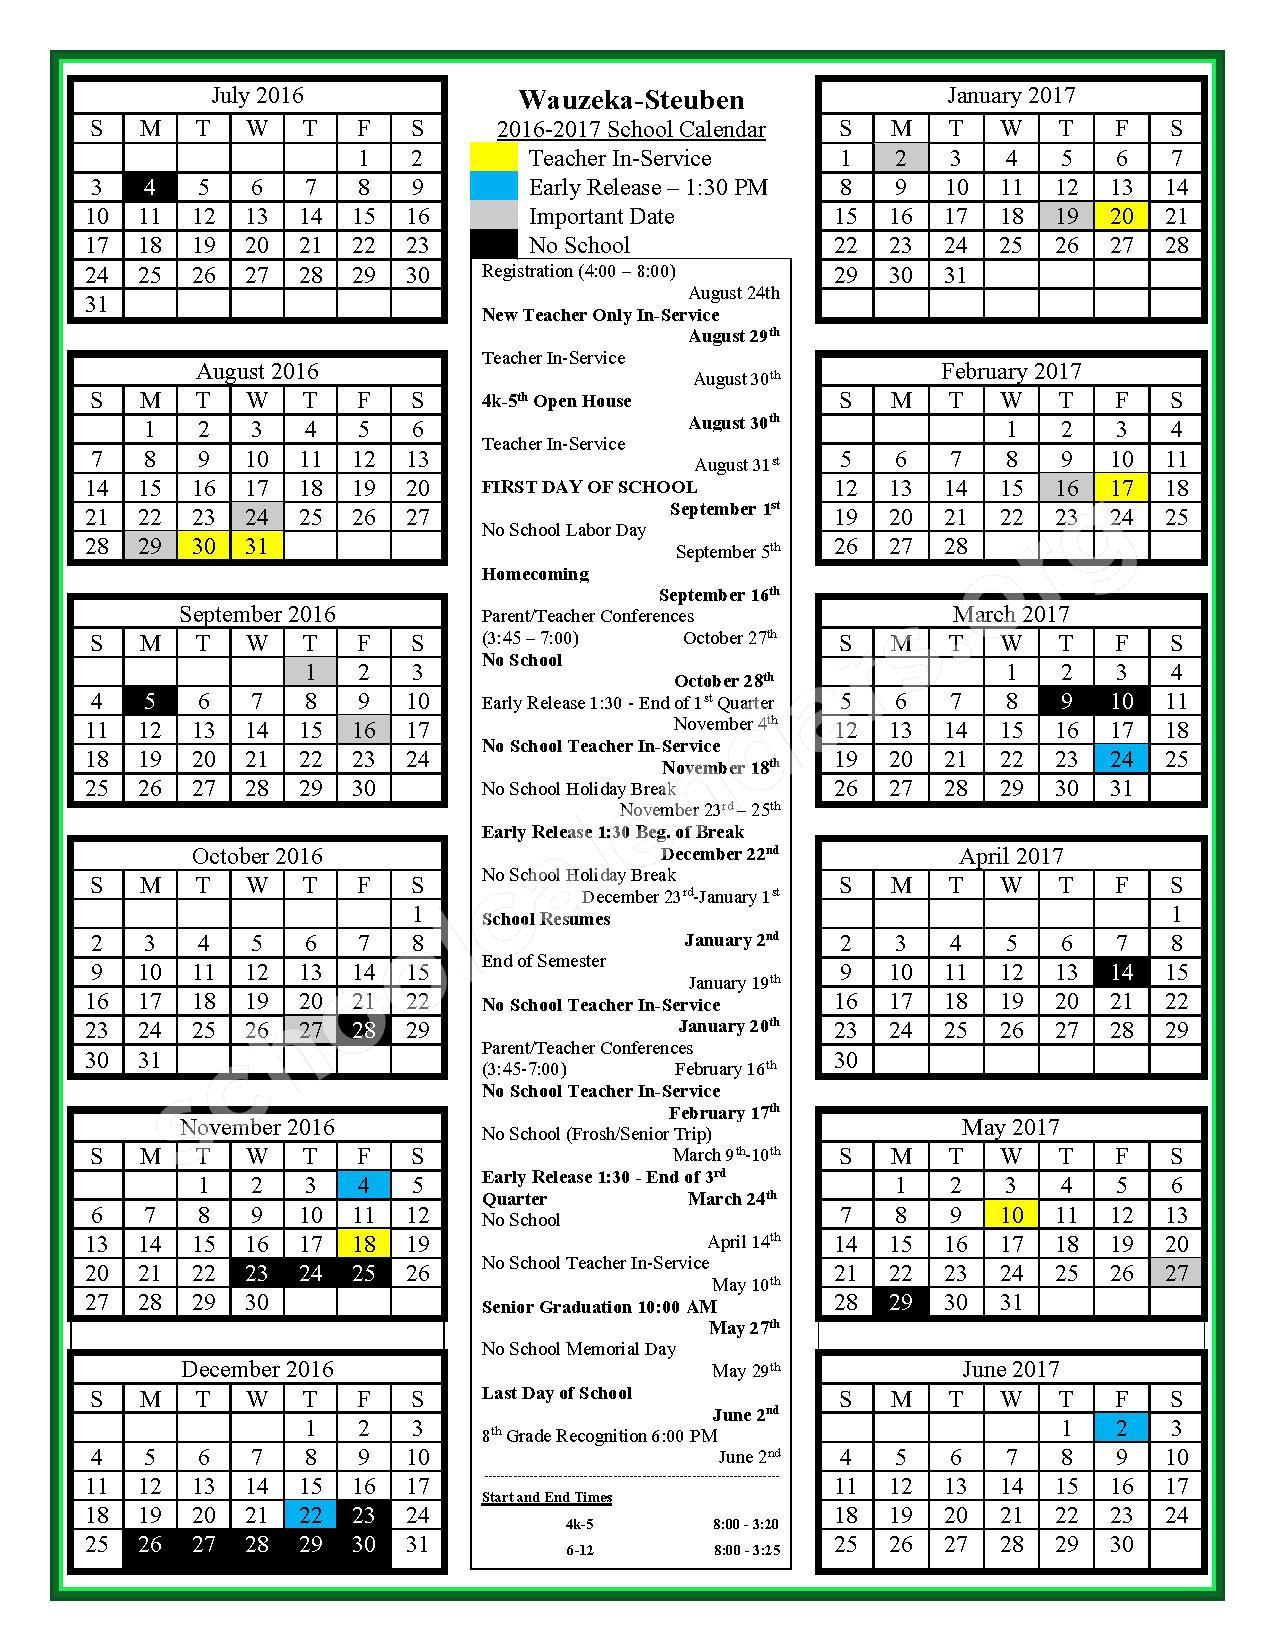 2016 - 2017 School Calendar – Wauzeka-Steuben School District – page 1